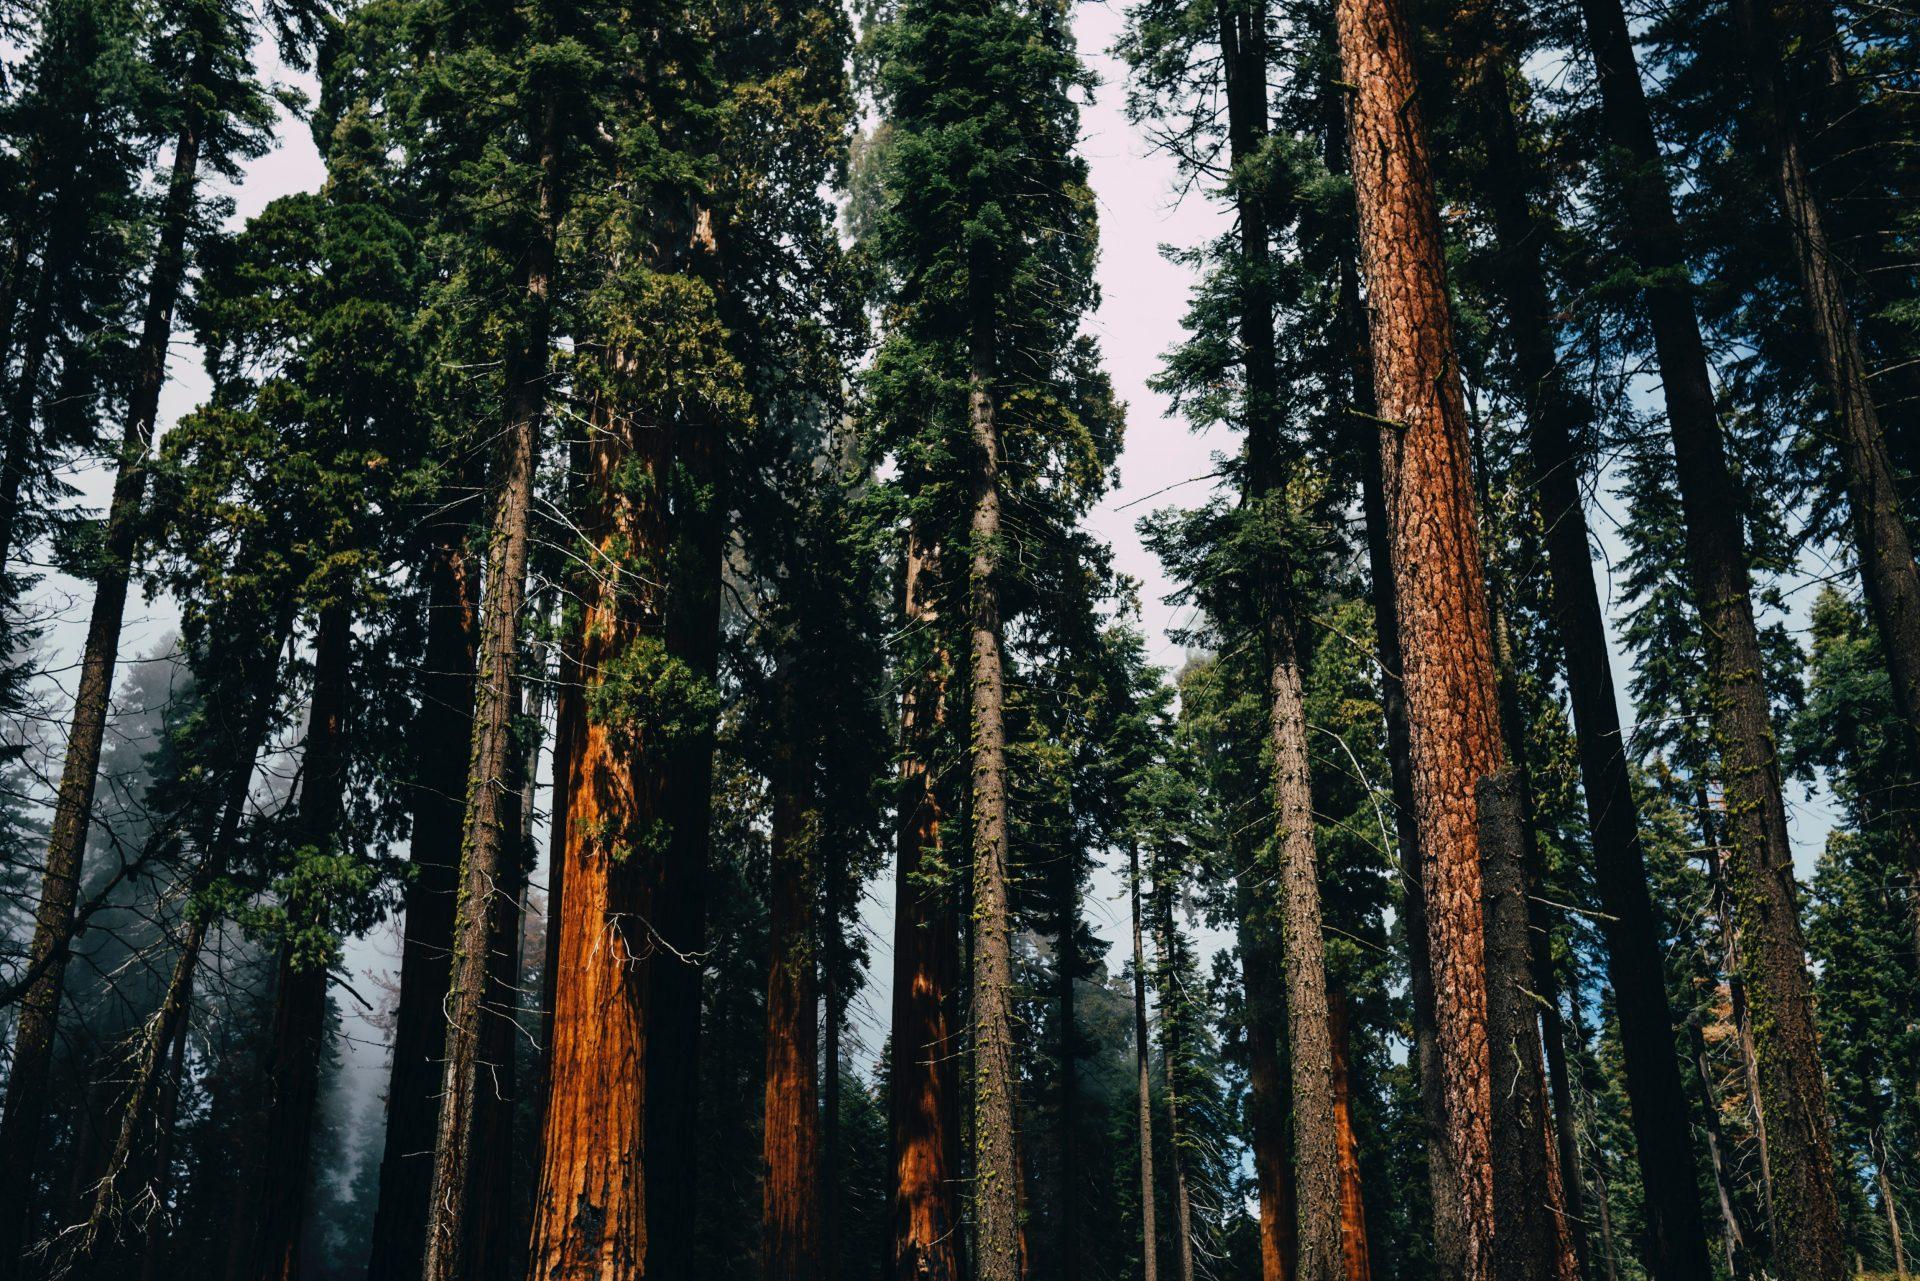 stromy-priroda-les-drevo-listie-ihlicie